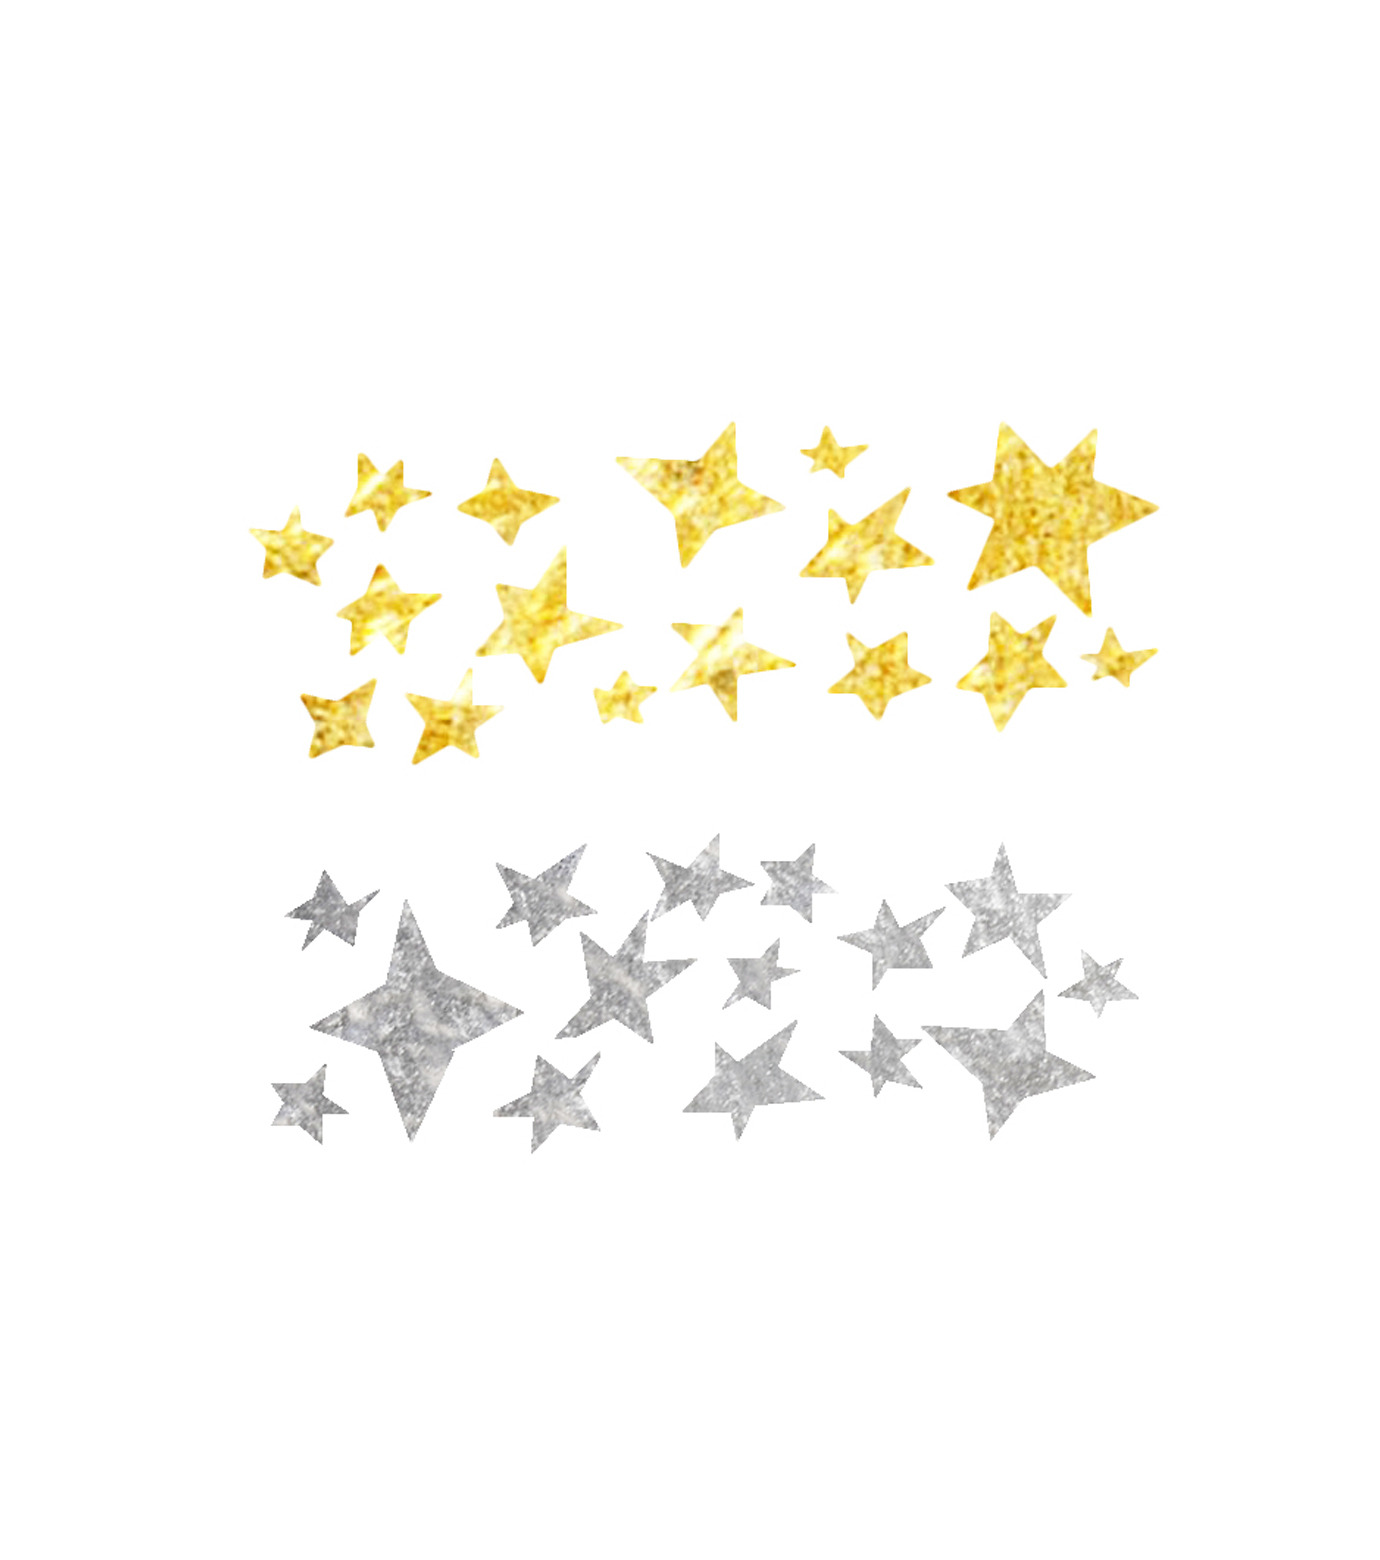 DCER(ディーシーイーアール)のMetallic Star Dust Tattoo-MULTI COLOUR(MAKE-UP/MAKE-UP)-SS15009-9 拡大詳細画像1